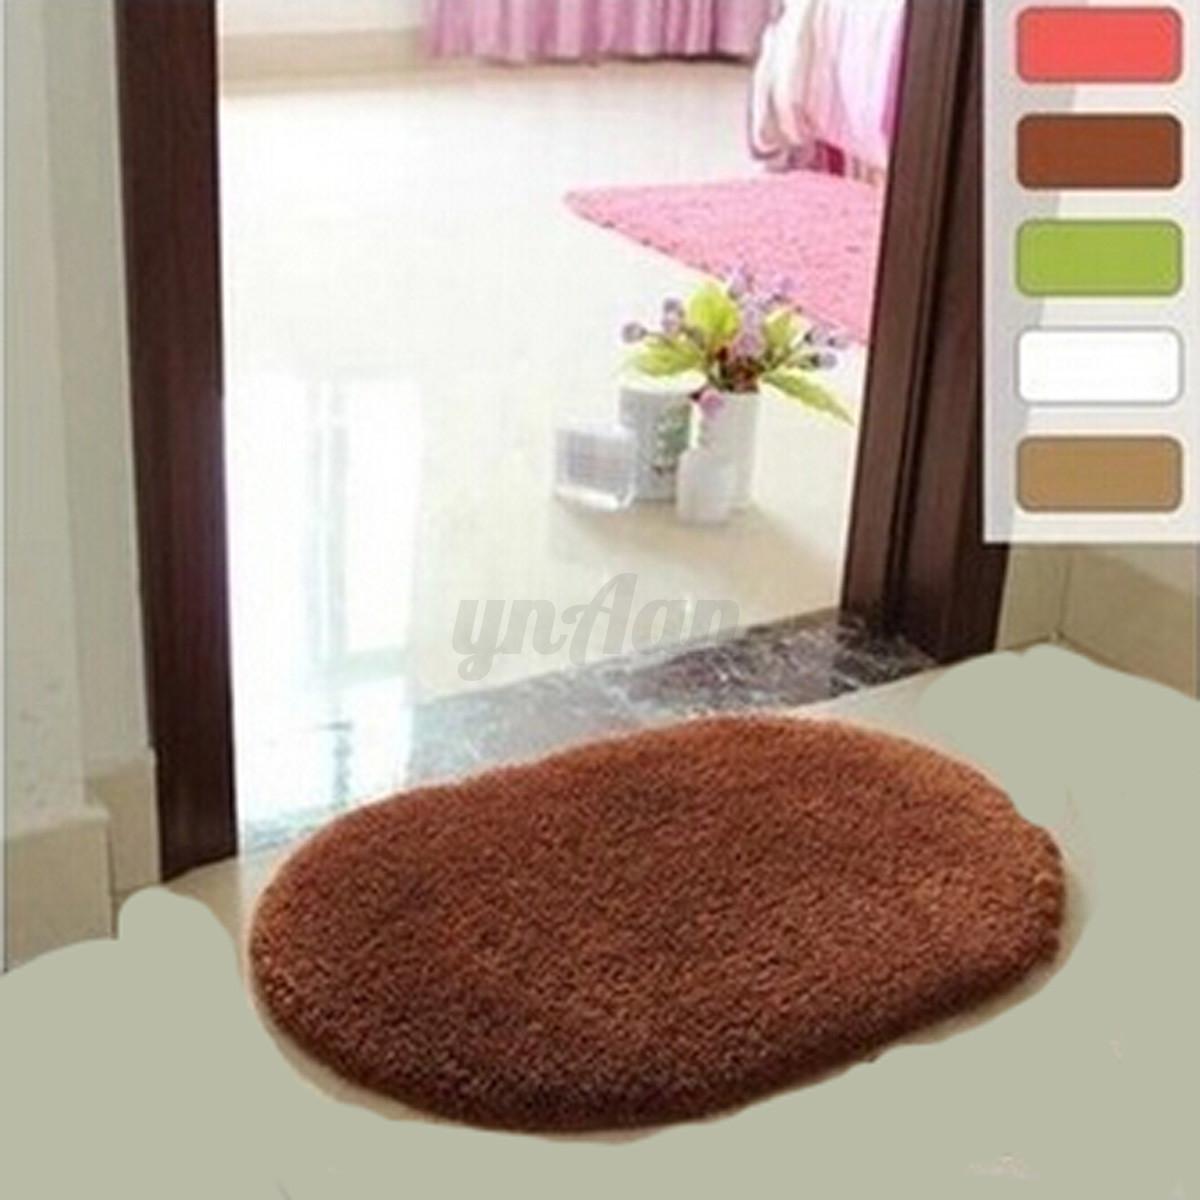 tapis de bain paillasson shaggy entr e sol carpette antid rapant douche salon ebay. Black Bedroom Furniture Sets. Home Design Ideas